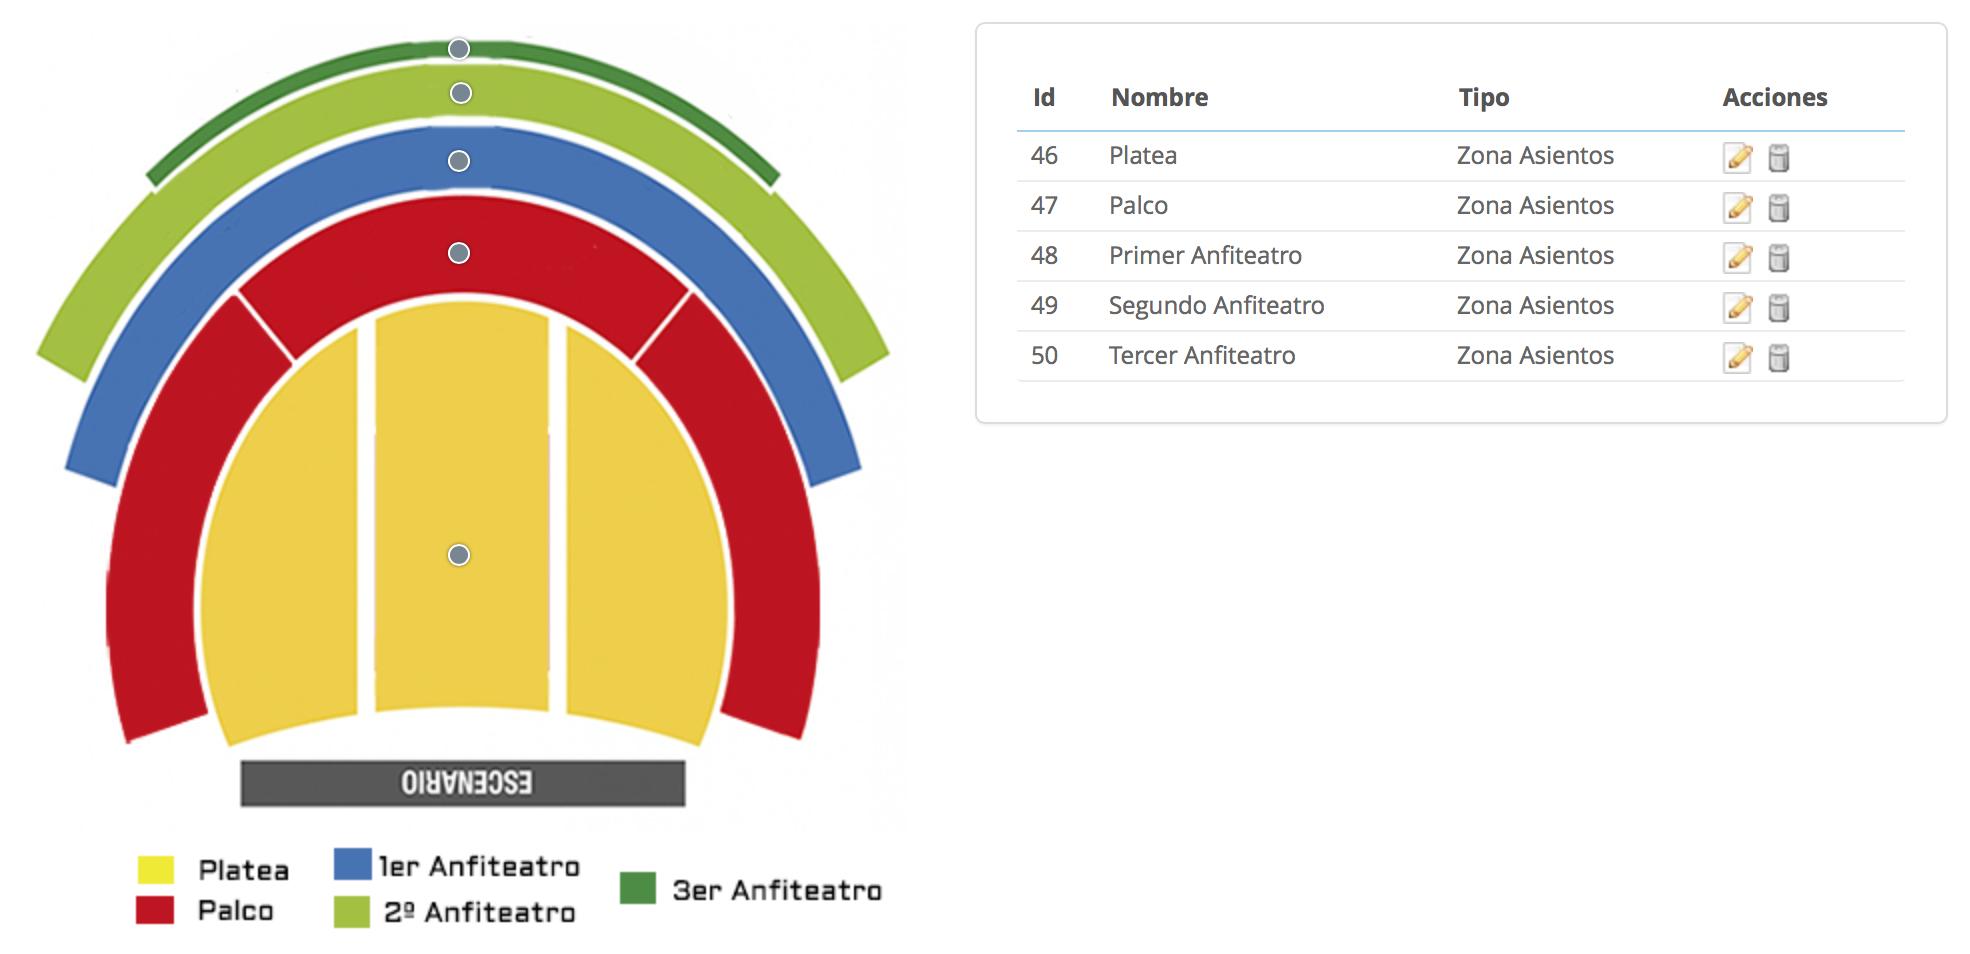 mapa para añadir las zonas de un teatro awselecseat